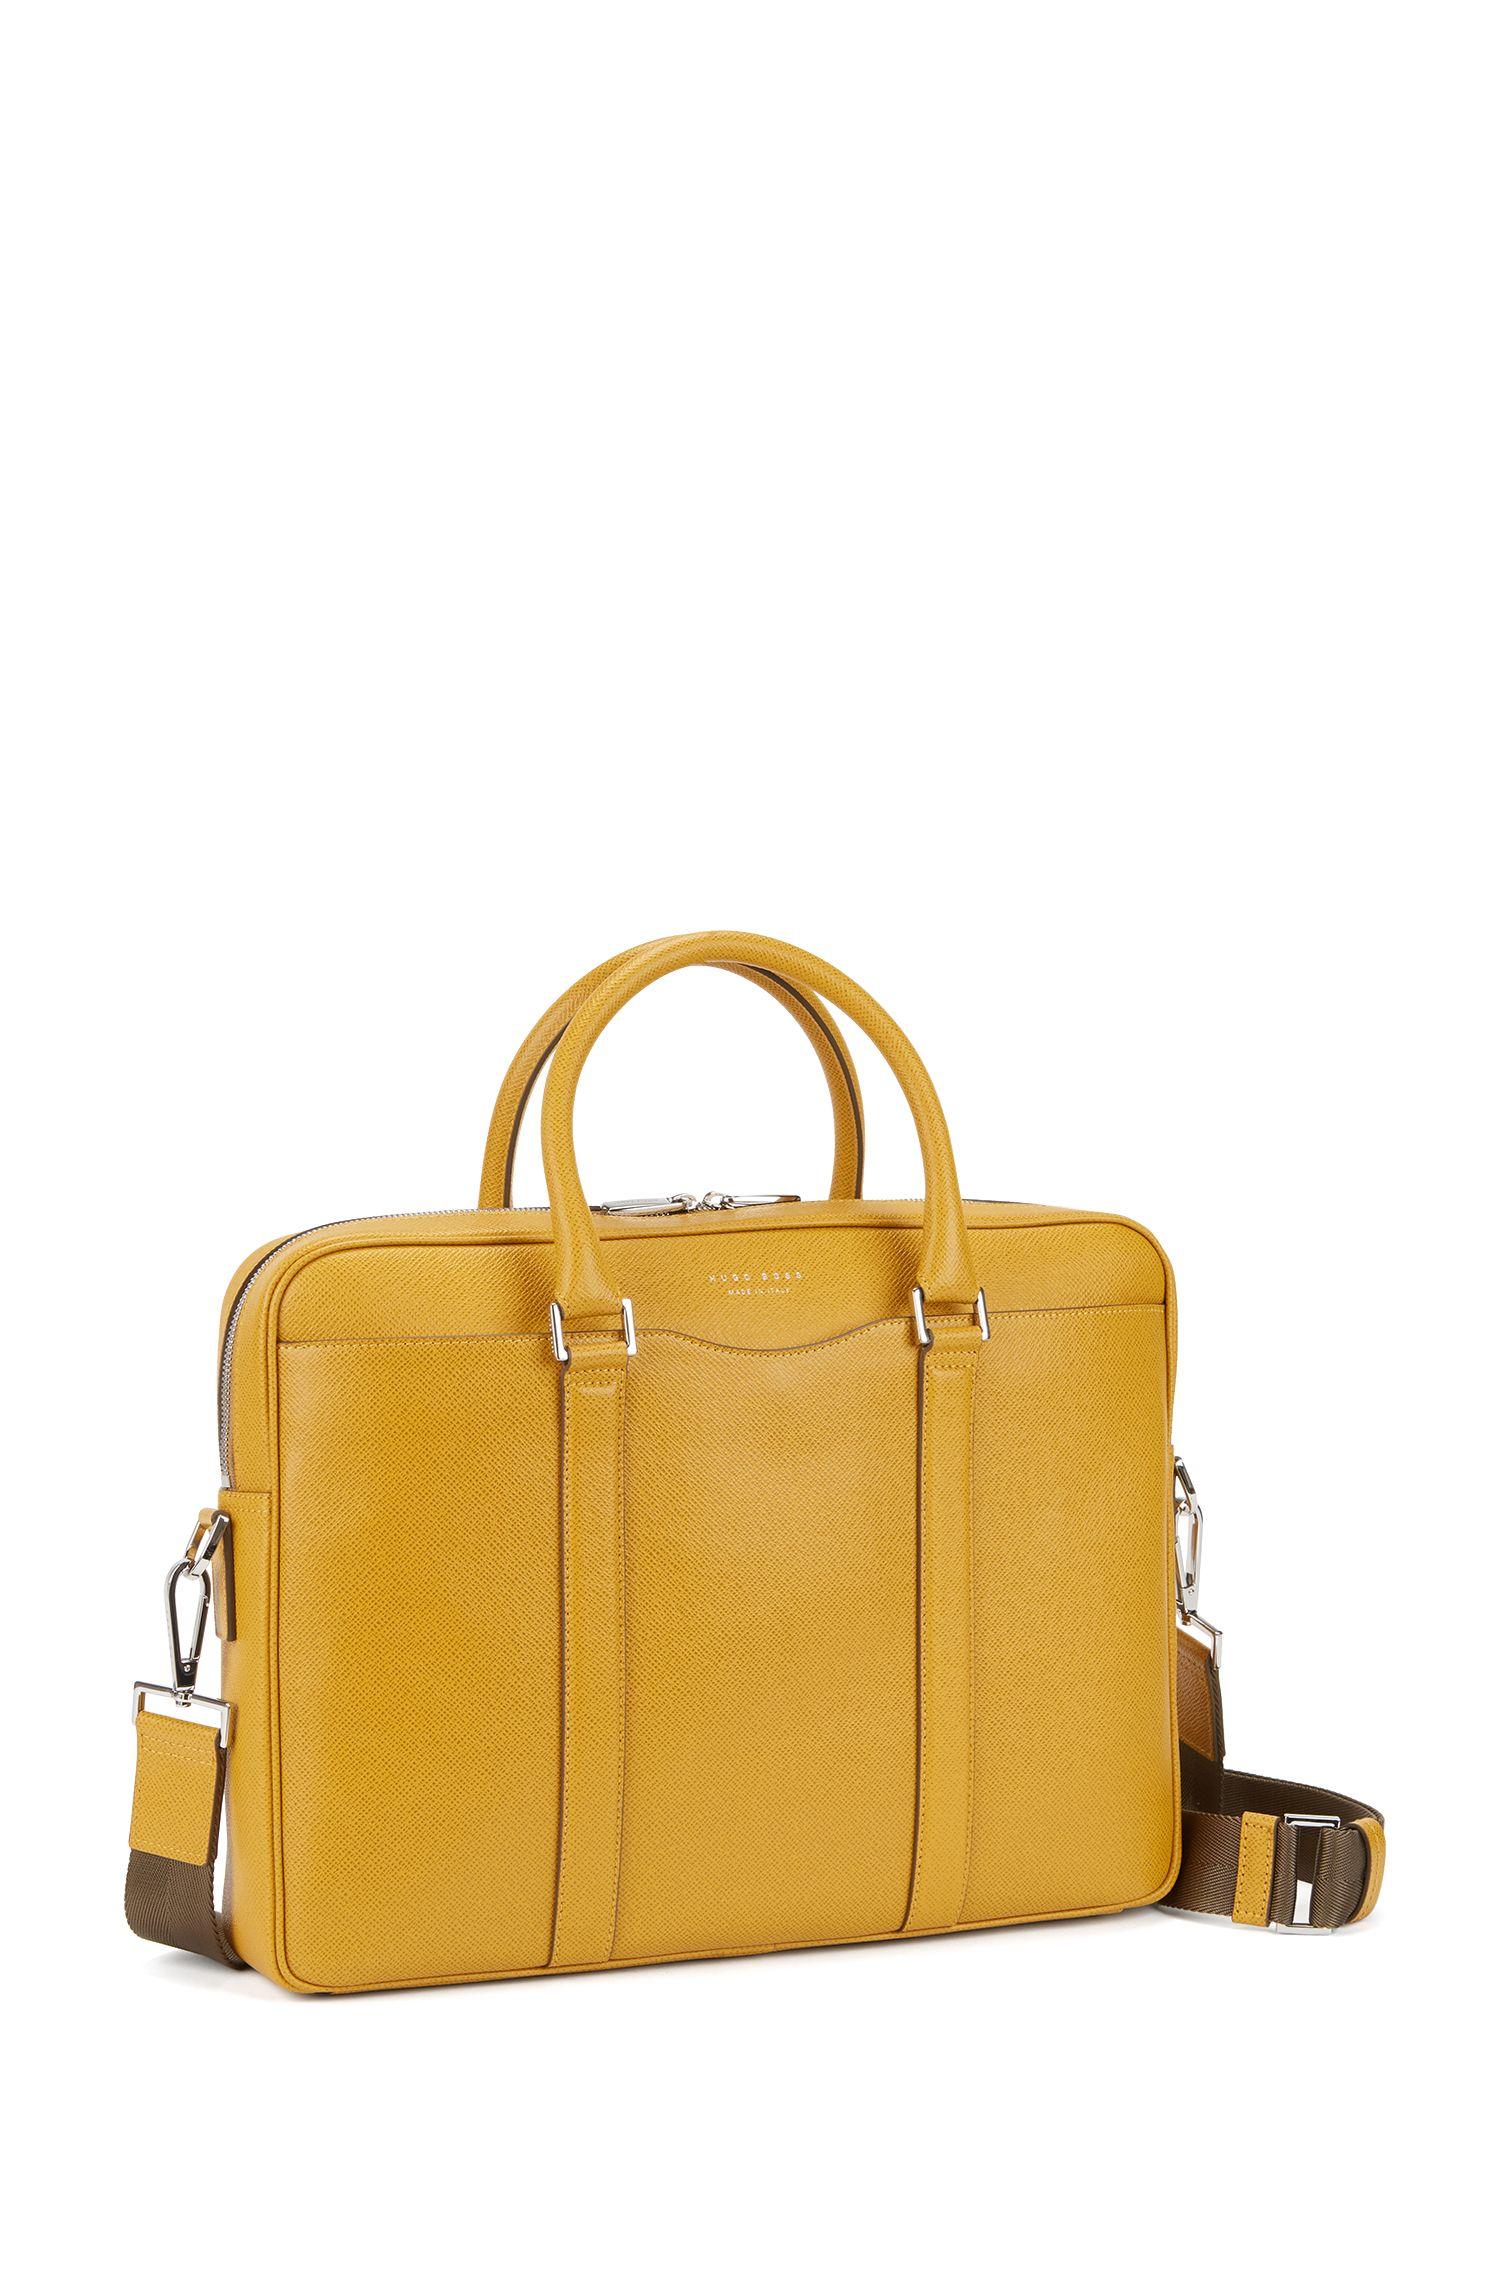 Signature Collection bag in palmellato leather